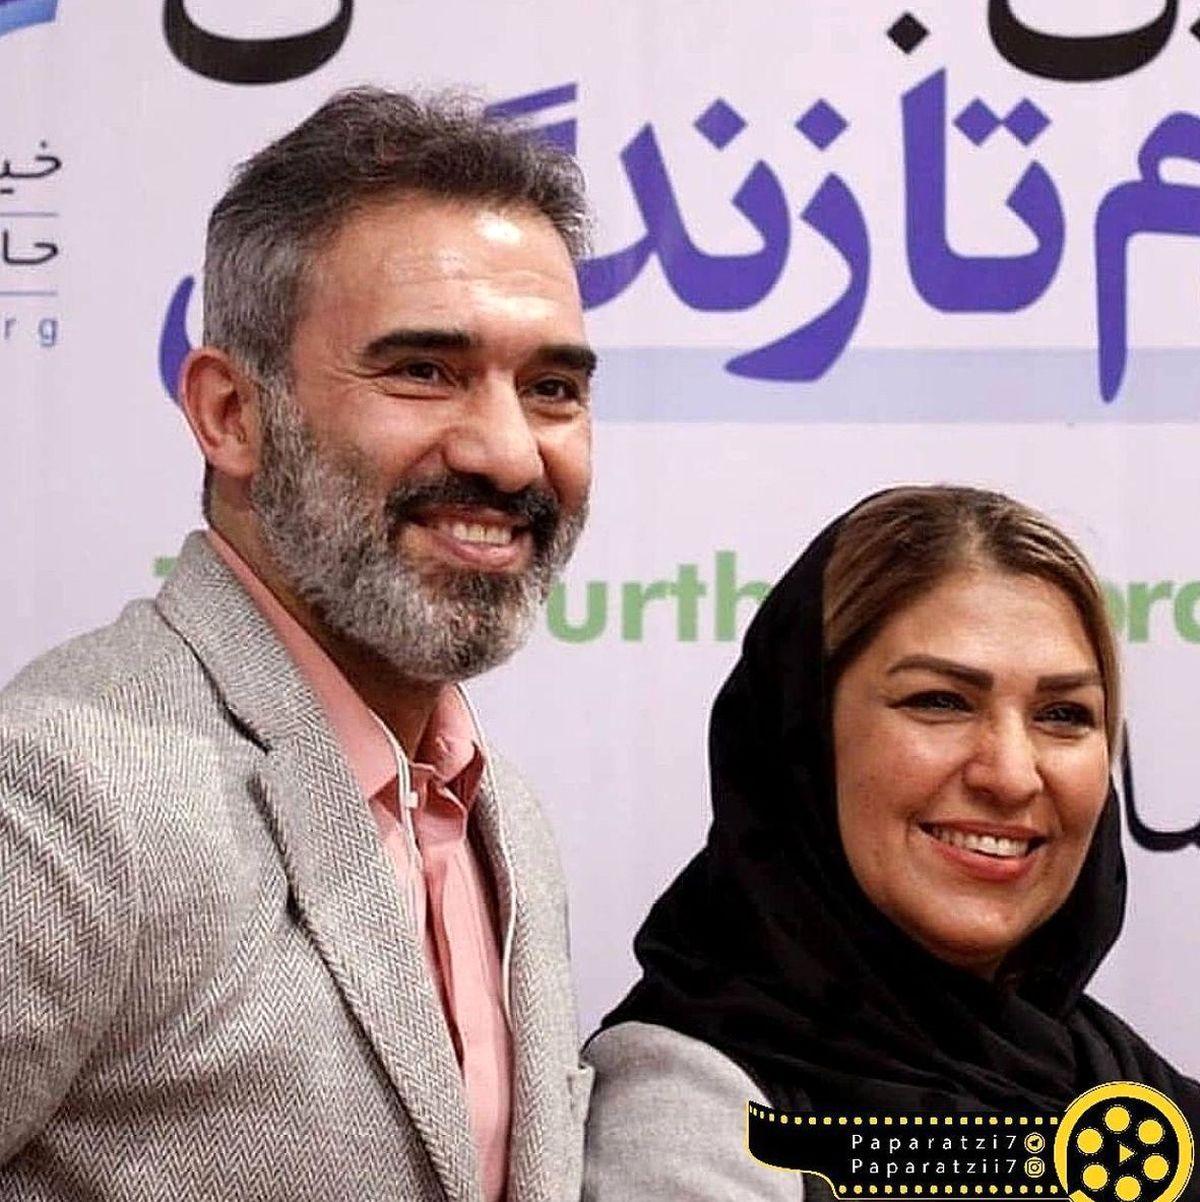 شباهت عجیب احمدرضا عابدزاده با پسرش / عکس لورفته